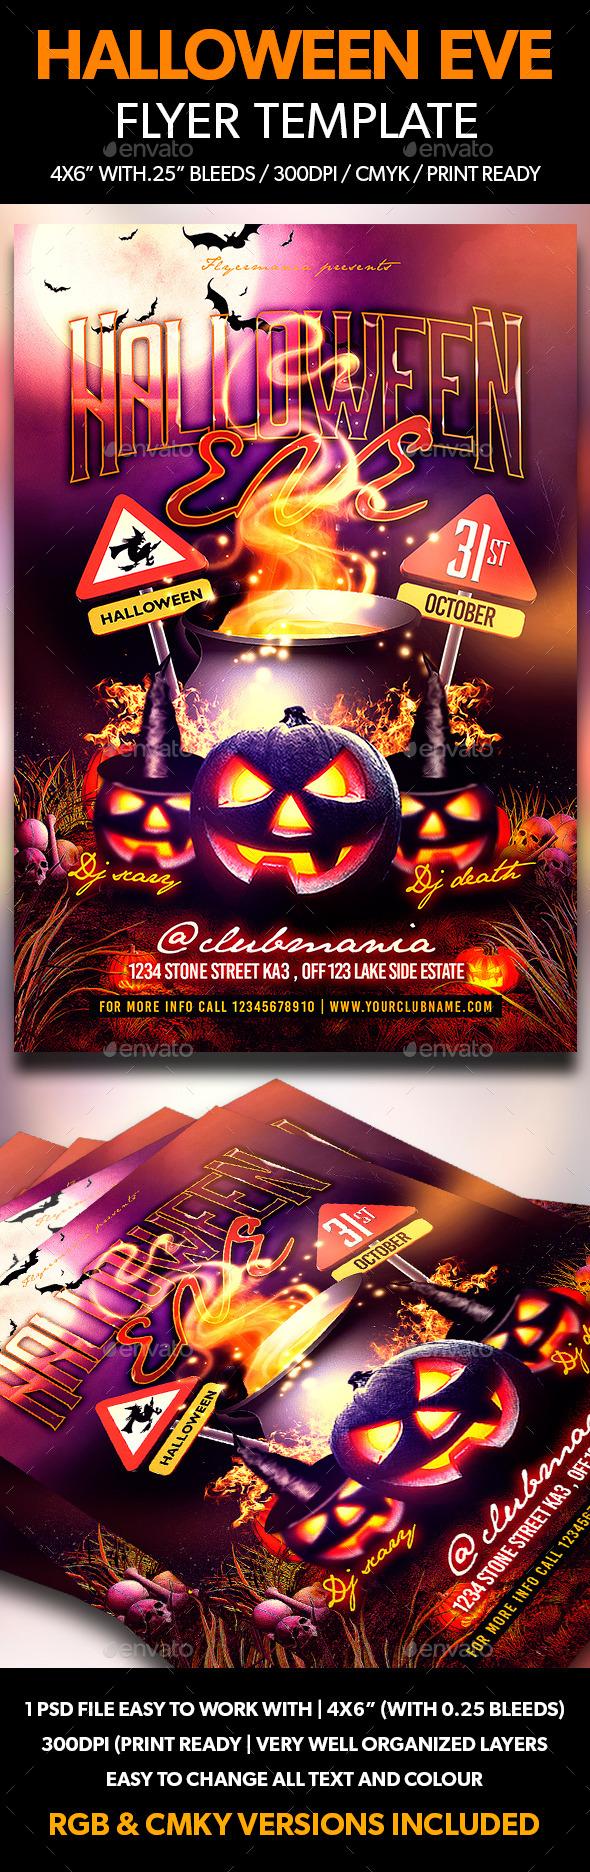 Halloween Eve Flyer Template